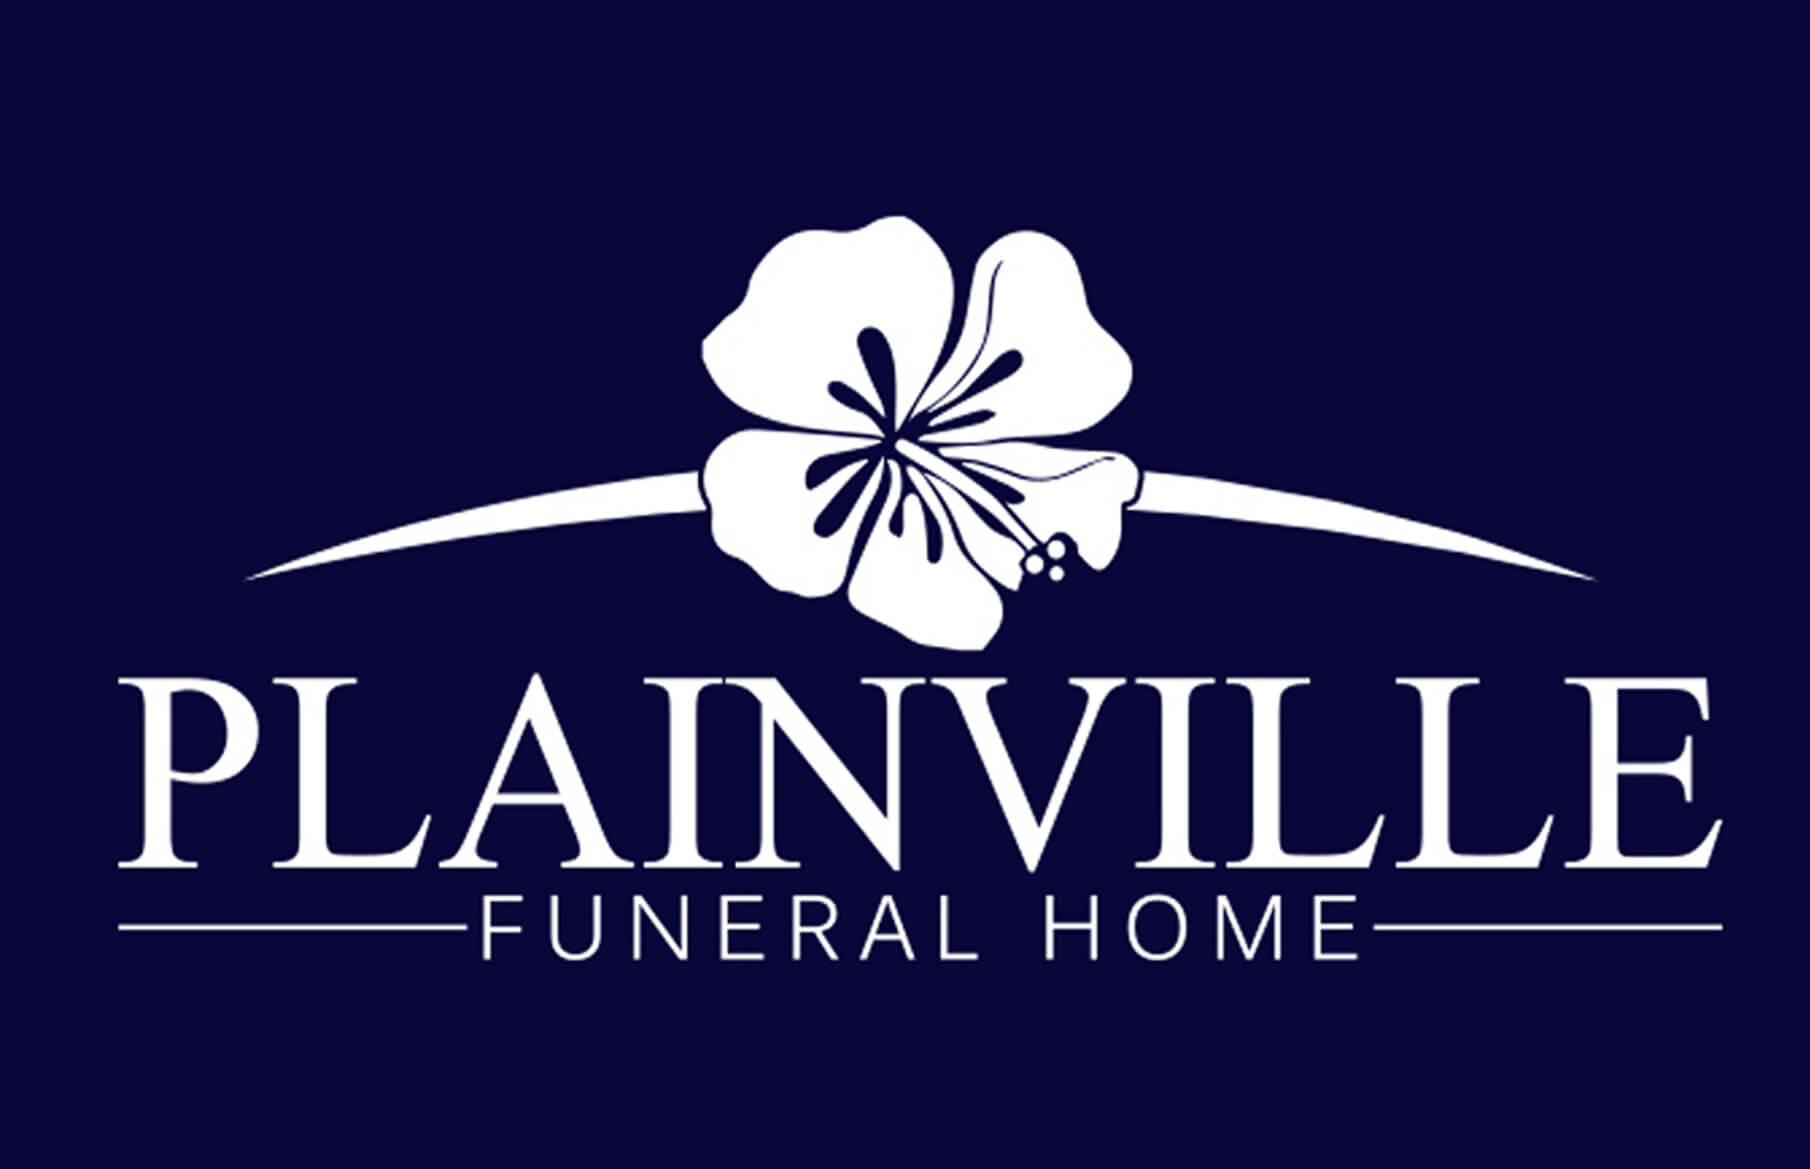 Plainville Funeral Home